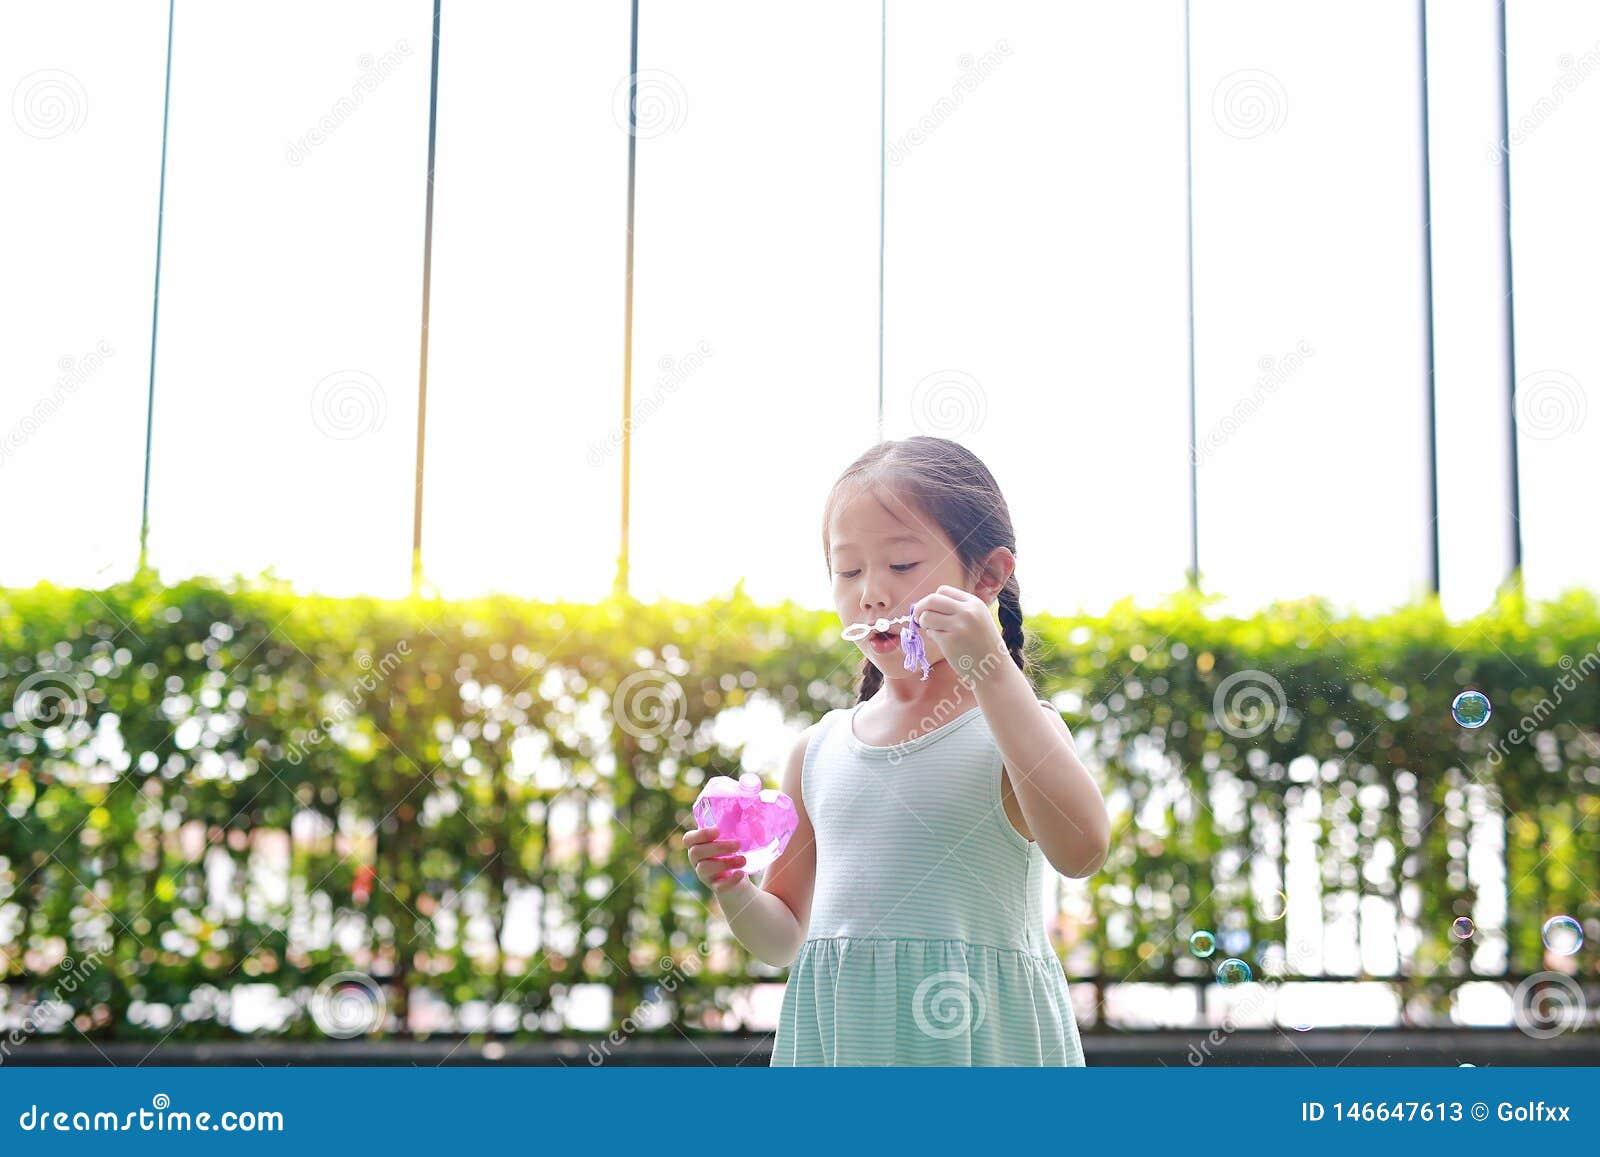 woman bubble Asian outdoor